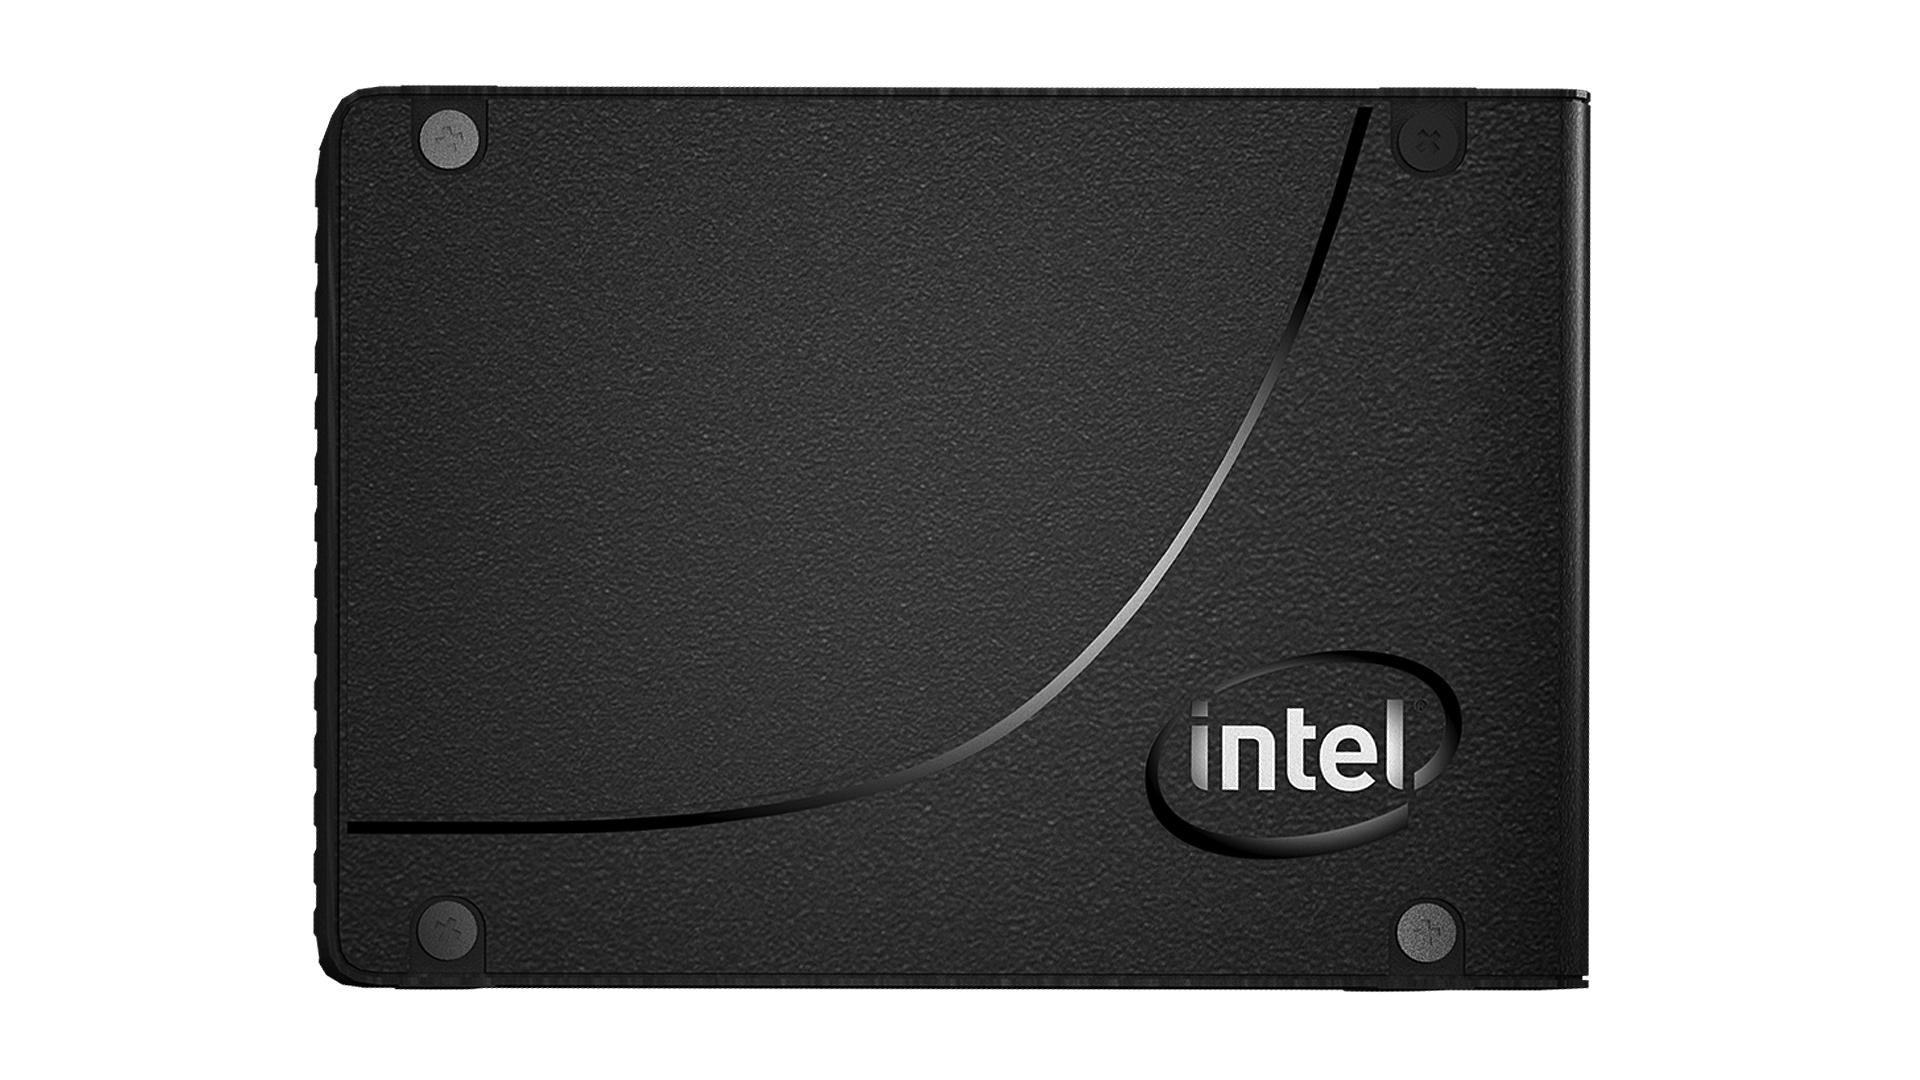 INTEL OPTANE SSDPE21K100GA01 INTERNAL SOLID STATE DRIVE U.2 100 GB PCI EXPRESS 3.0 3D XPOINT NVME